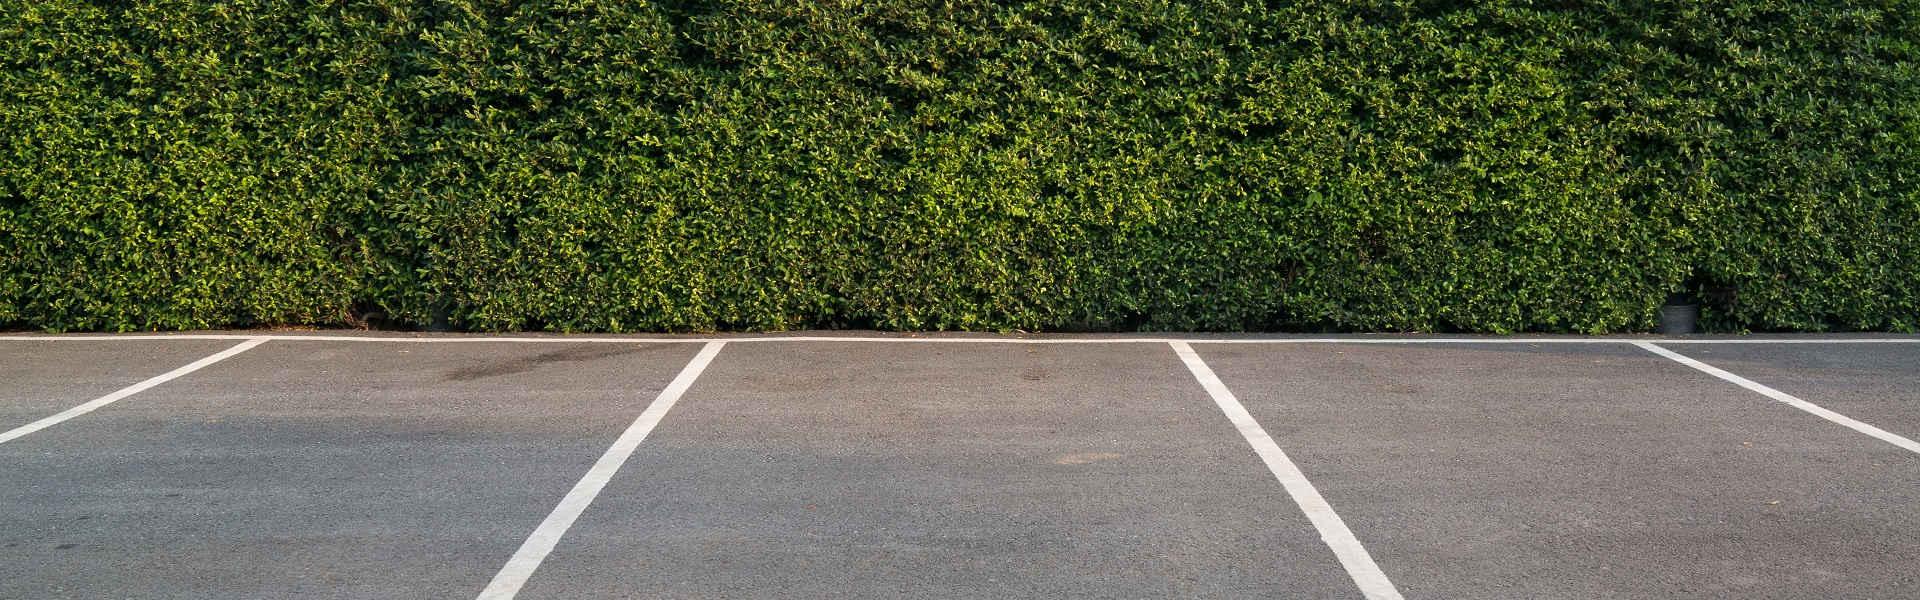 Does Car Insurance Cover A Stolen Car? | Bingle